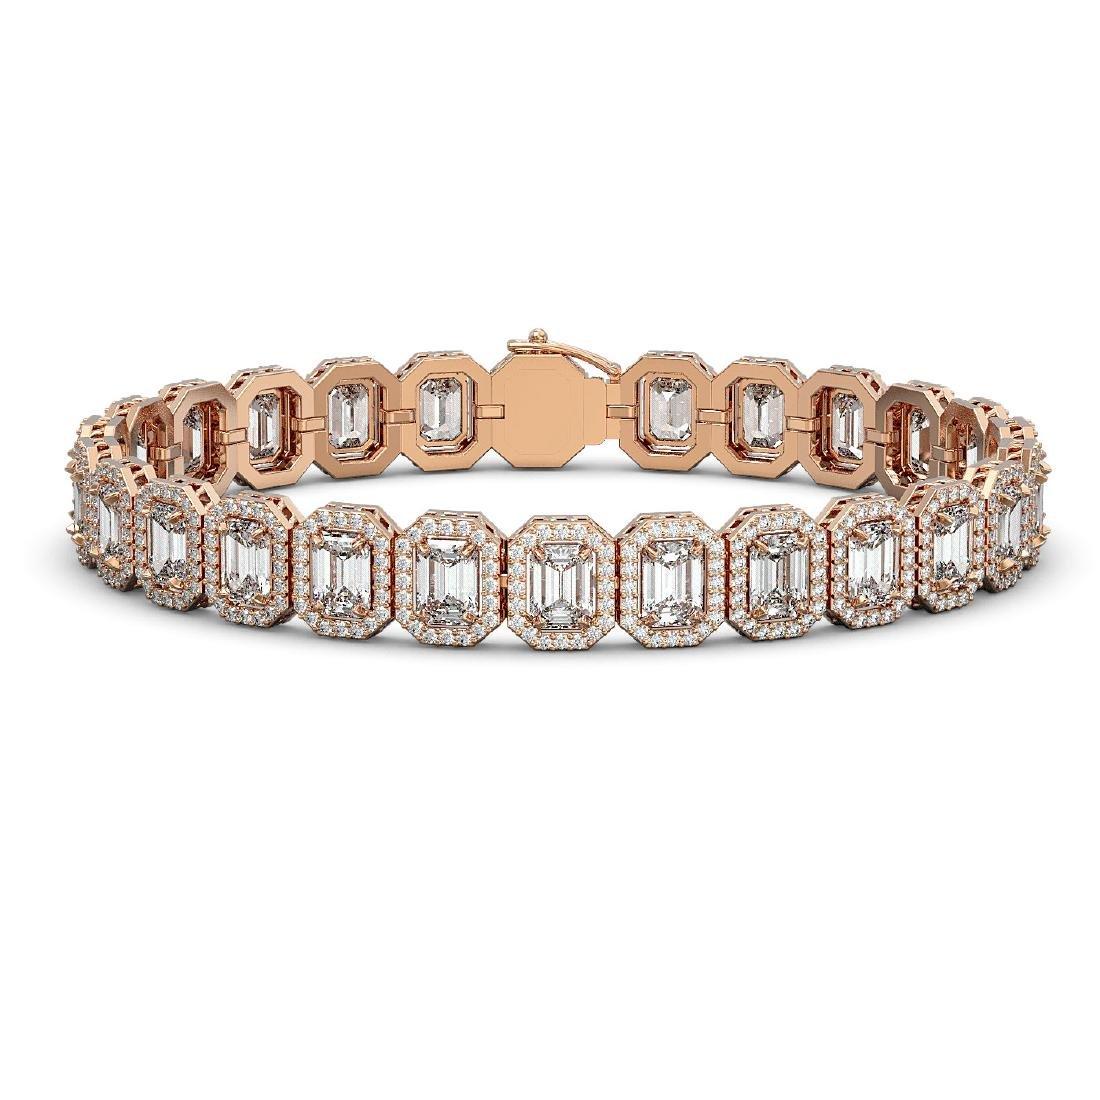 20.25 CTW Emerald Cut Diamond Designer Bracelet 18K